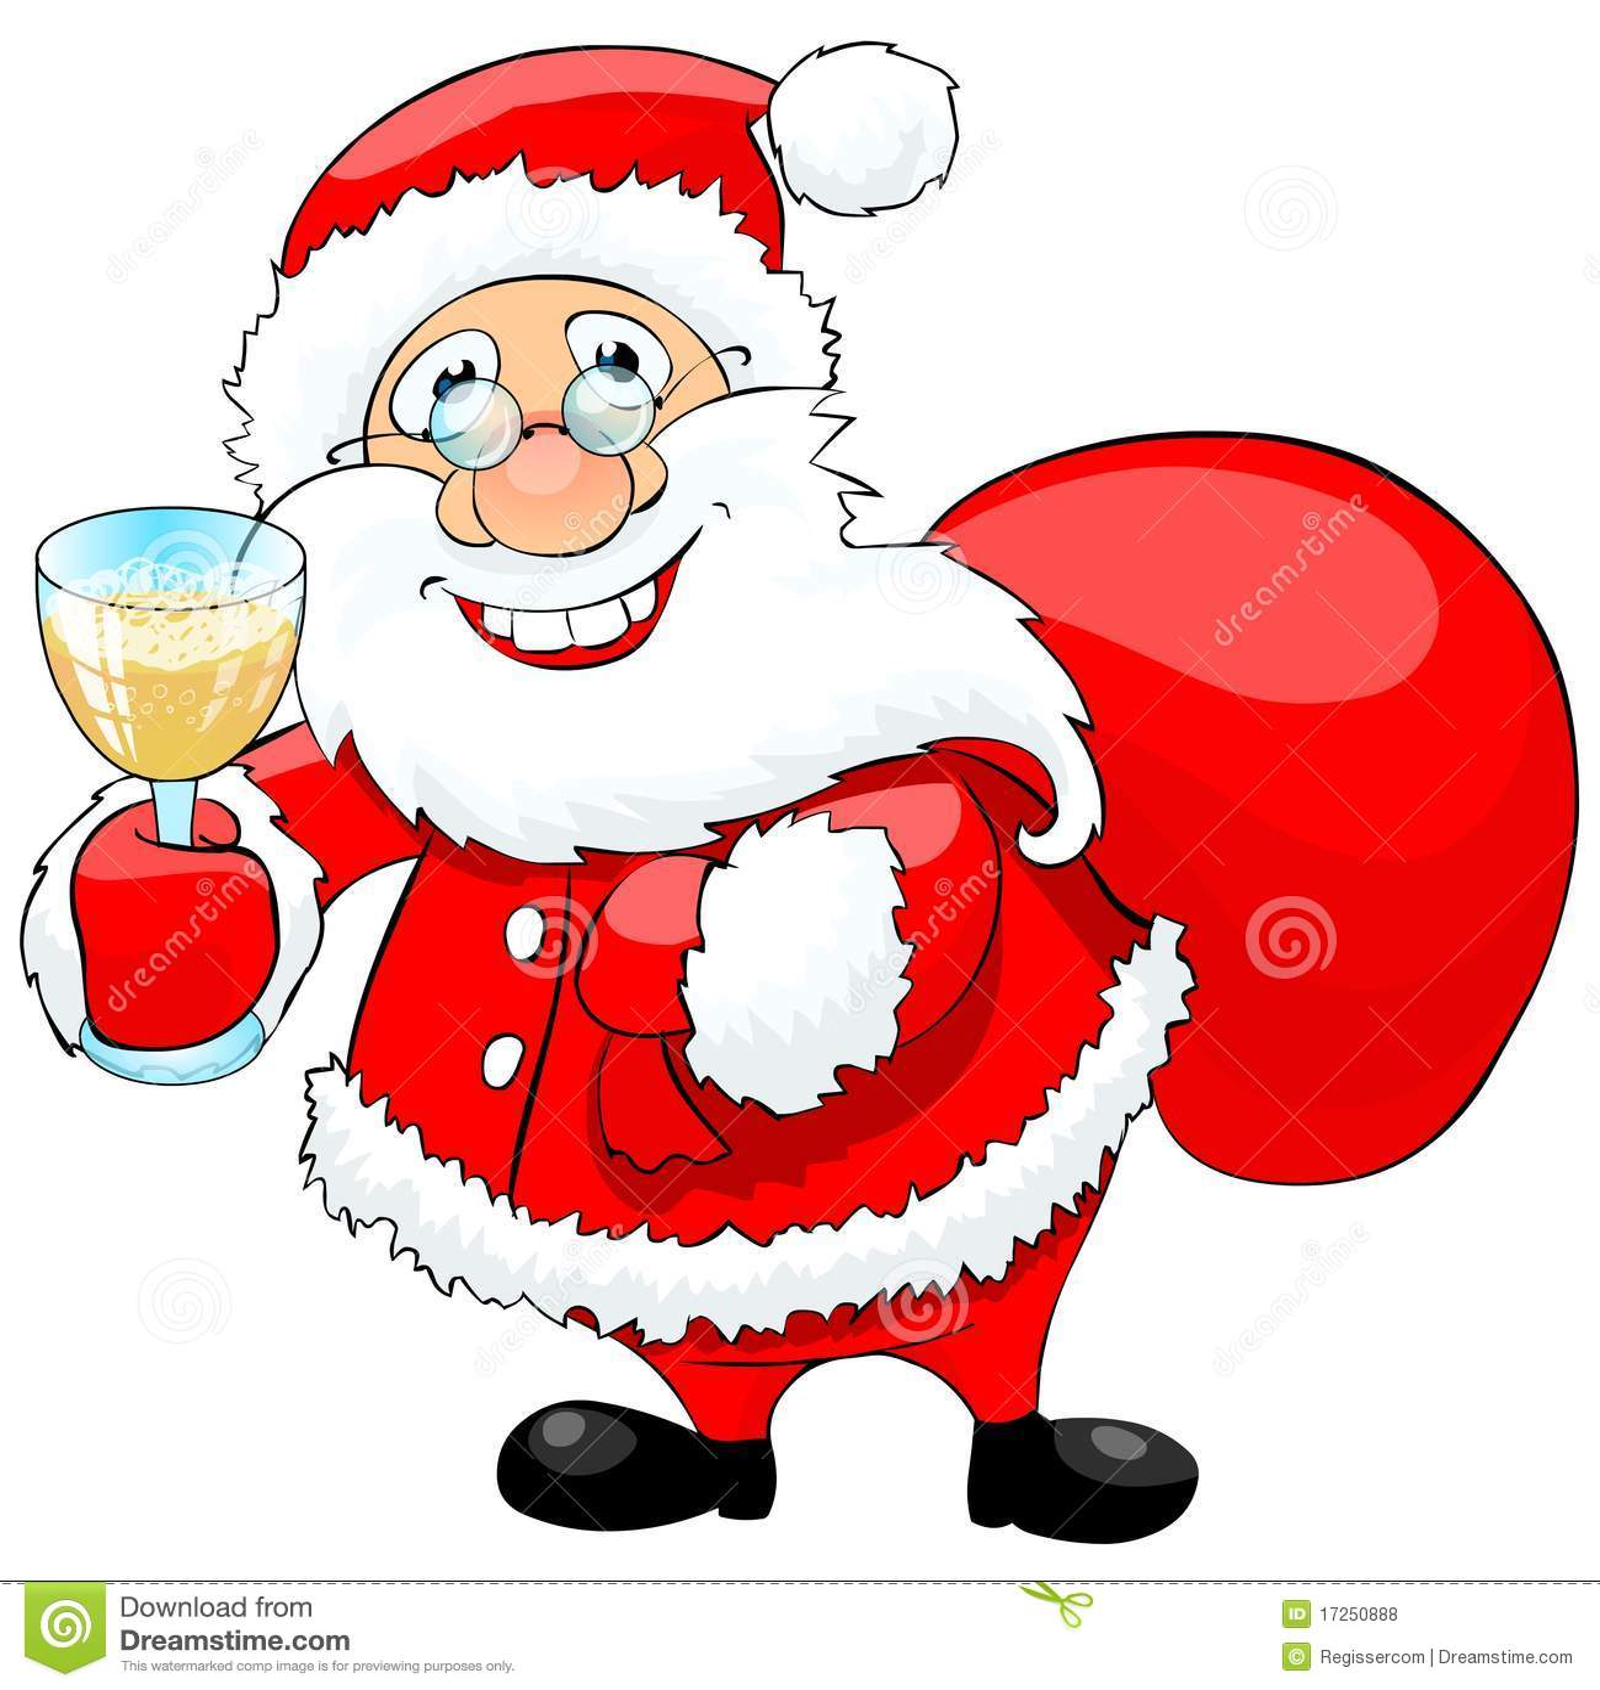 santa claus celebrating the new year royalty free stock photos image 17250888